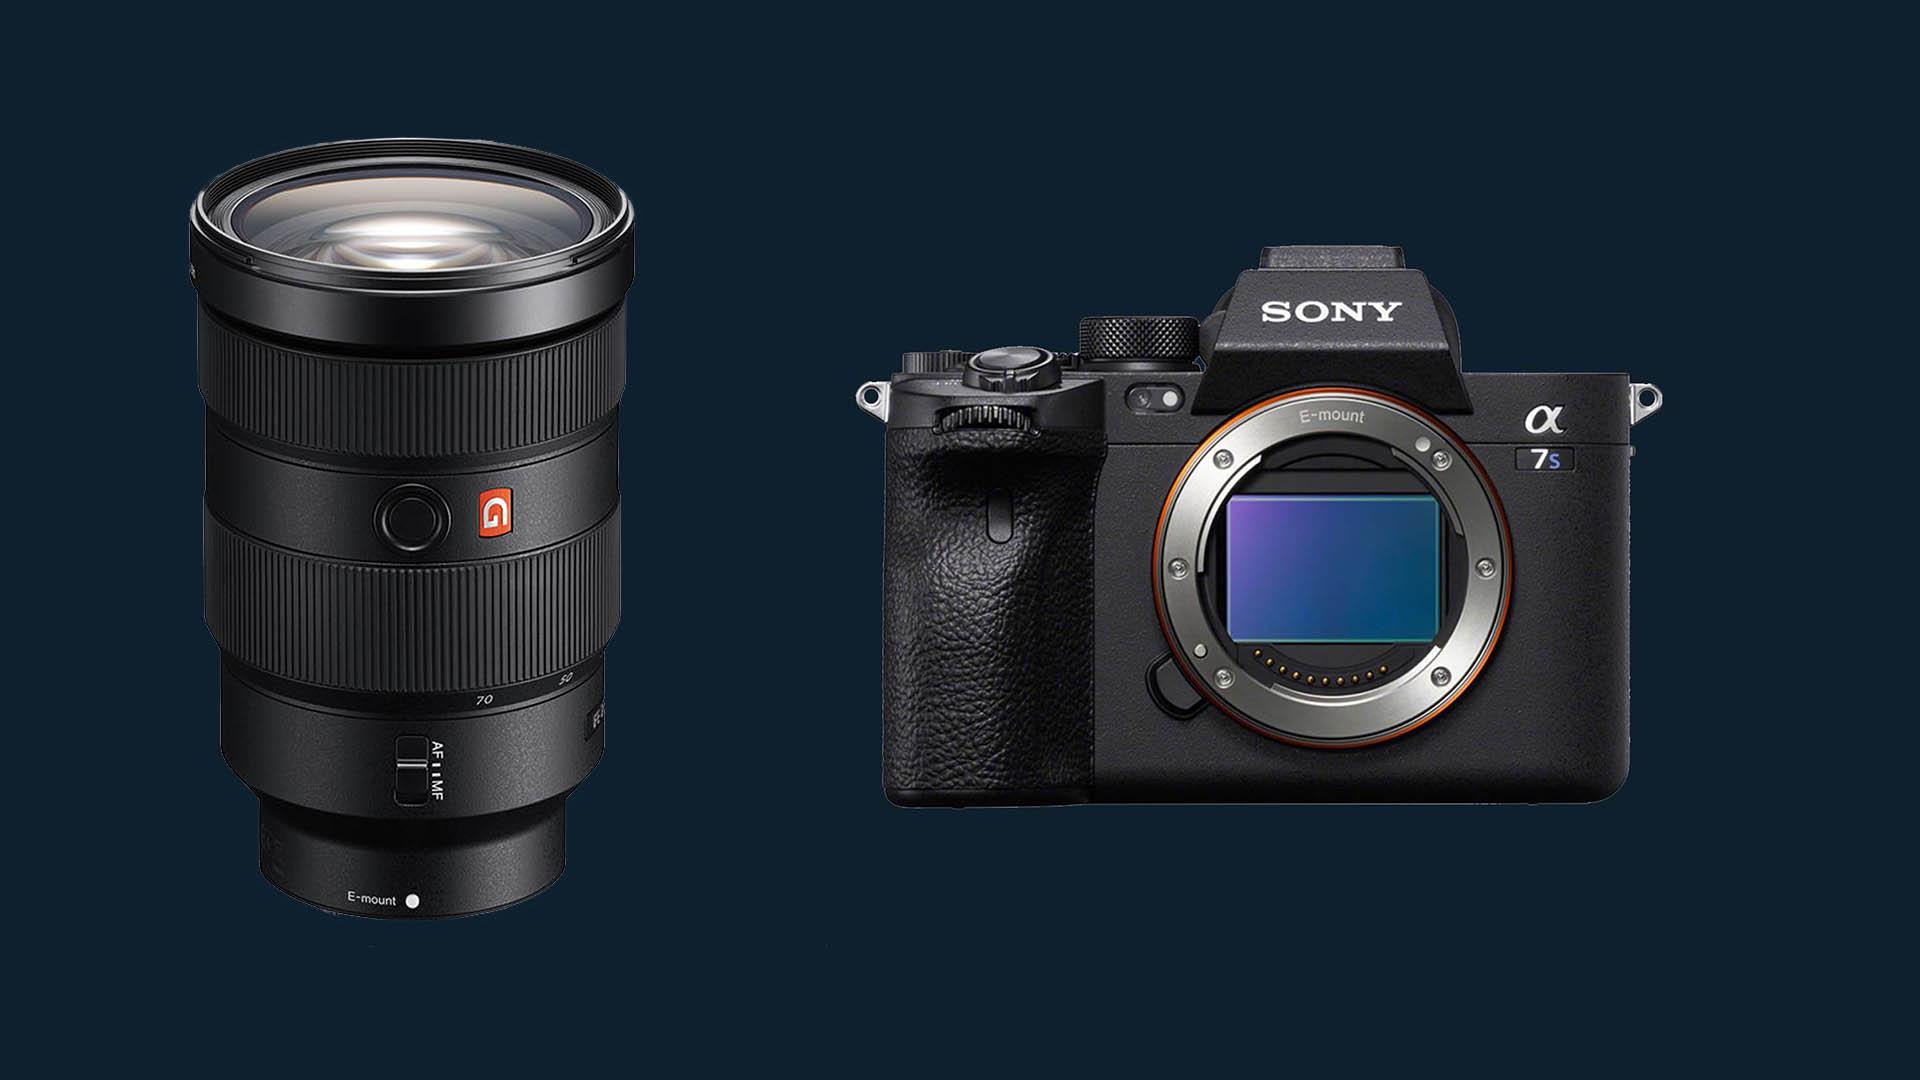 Sony A7S III + Sigma Art Objektive (14-24mm, 24-70mm, F2.8)